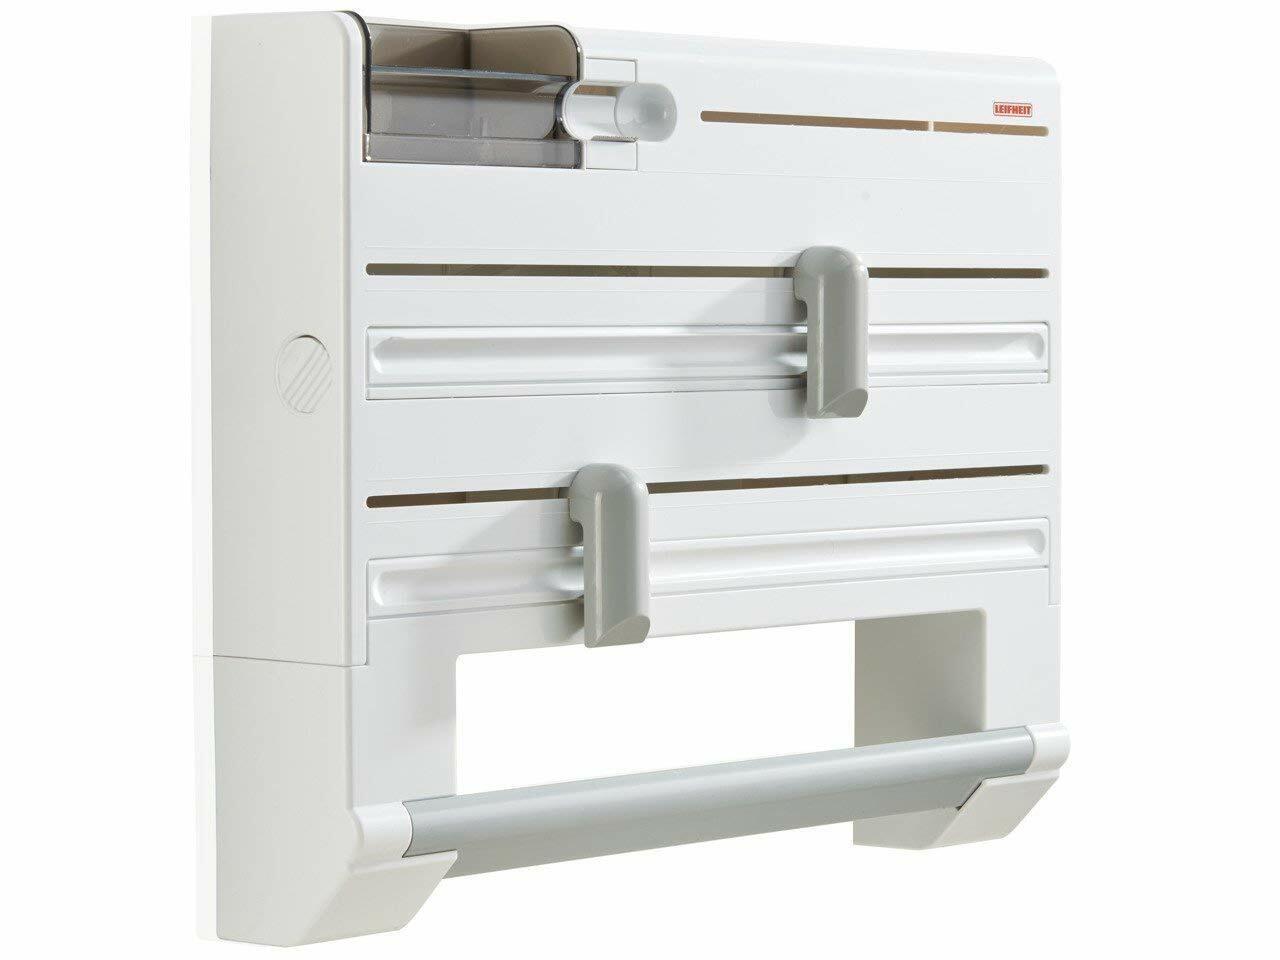 Kitchen Roll + Cling Film Holder Dispenser Wall Mounted Easy Dispenser Cutting